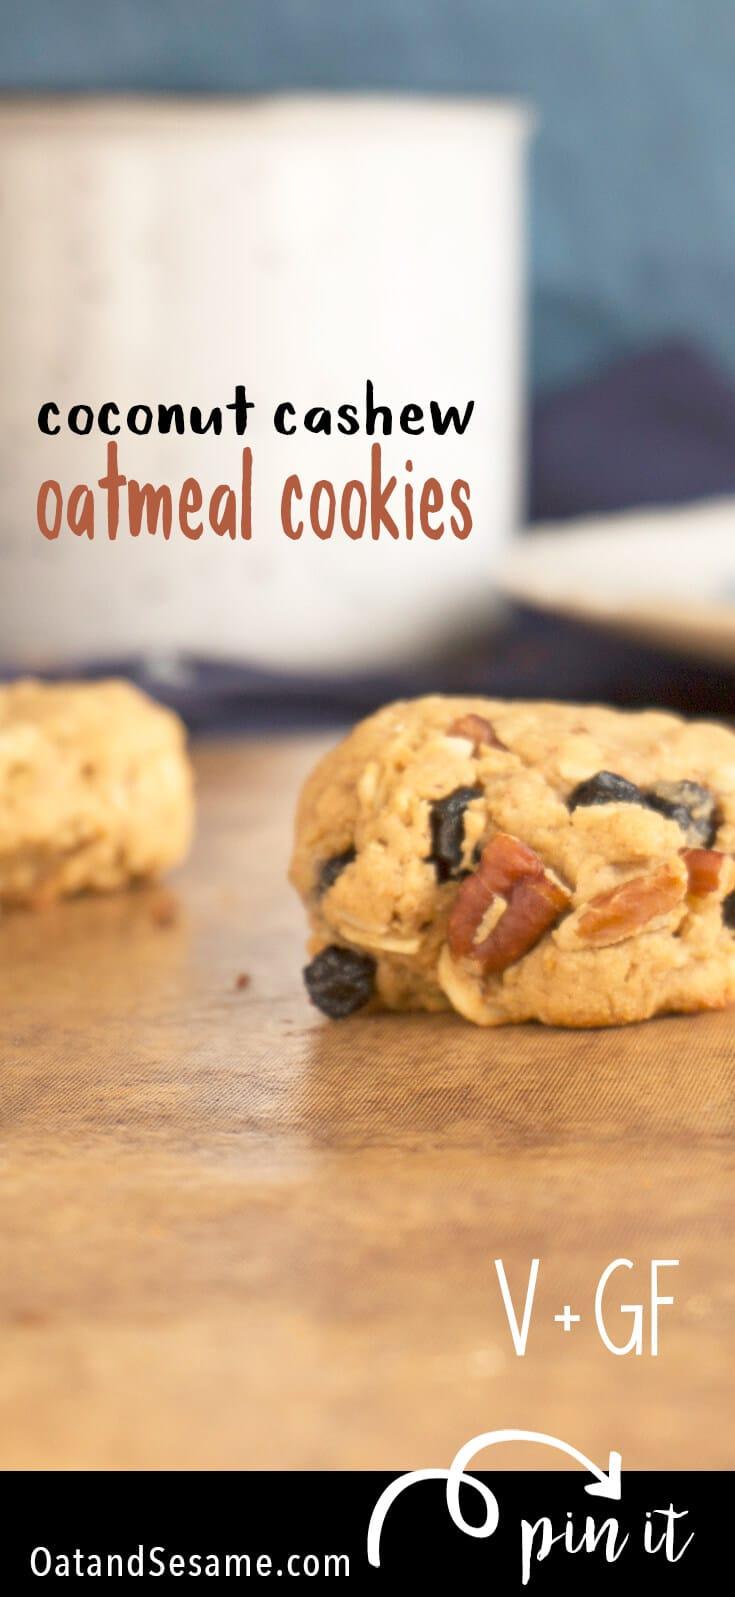 Coconut Cashew Oatmeal Cookies - Vegan + Gluten Free Snacks!   COOKIES   VEGAN   GLUTEN FREE   DESSERT   Recipe at OatandSesame.com